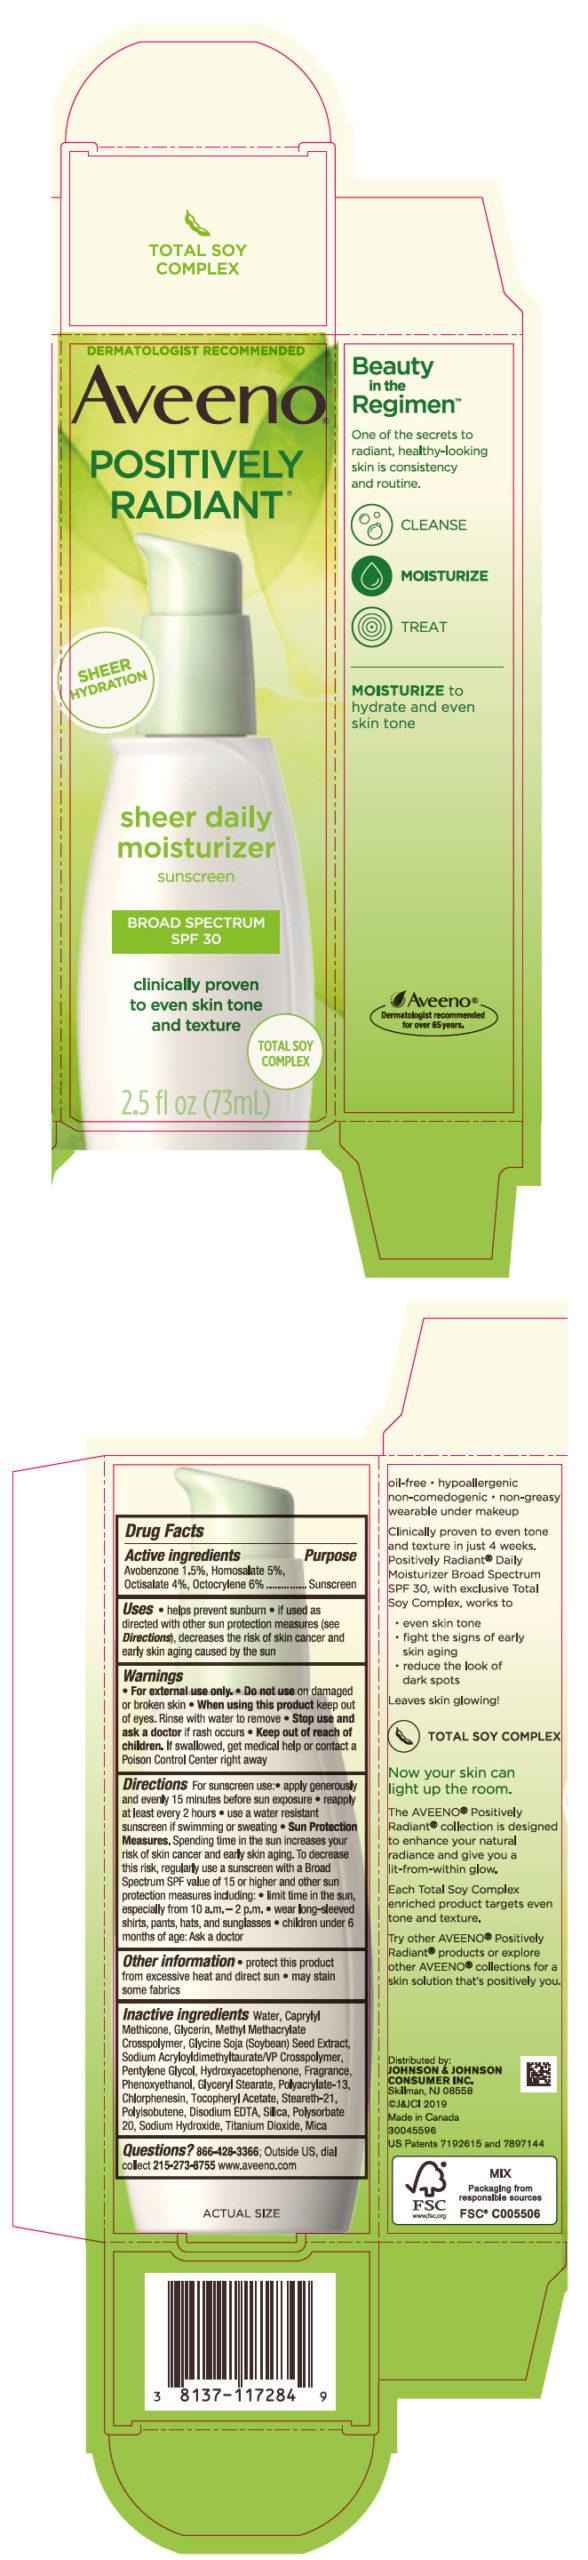 Avobenzone, Homosalate, Octisalate, and Octocrylene (Aveeno POSITIVELY RADIANT sheer daily moisturizer sunscreen BROAD SPECTRUM SPF 30)